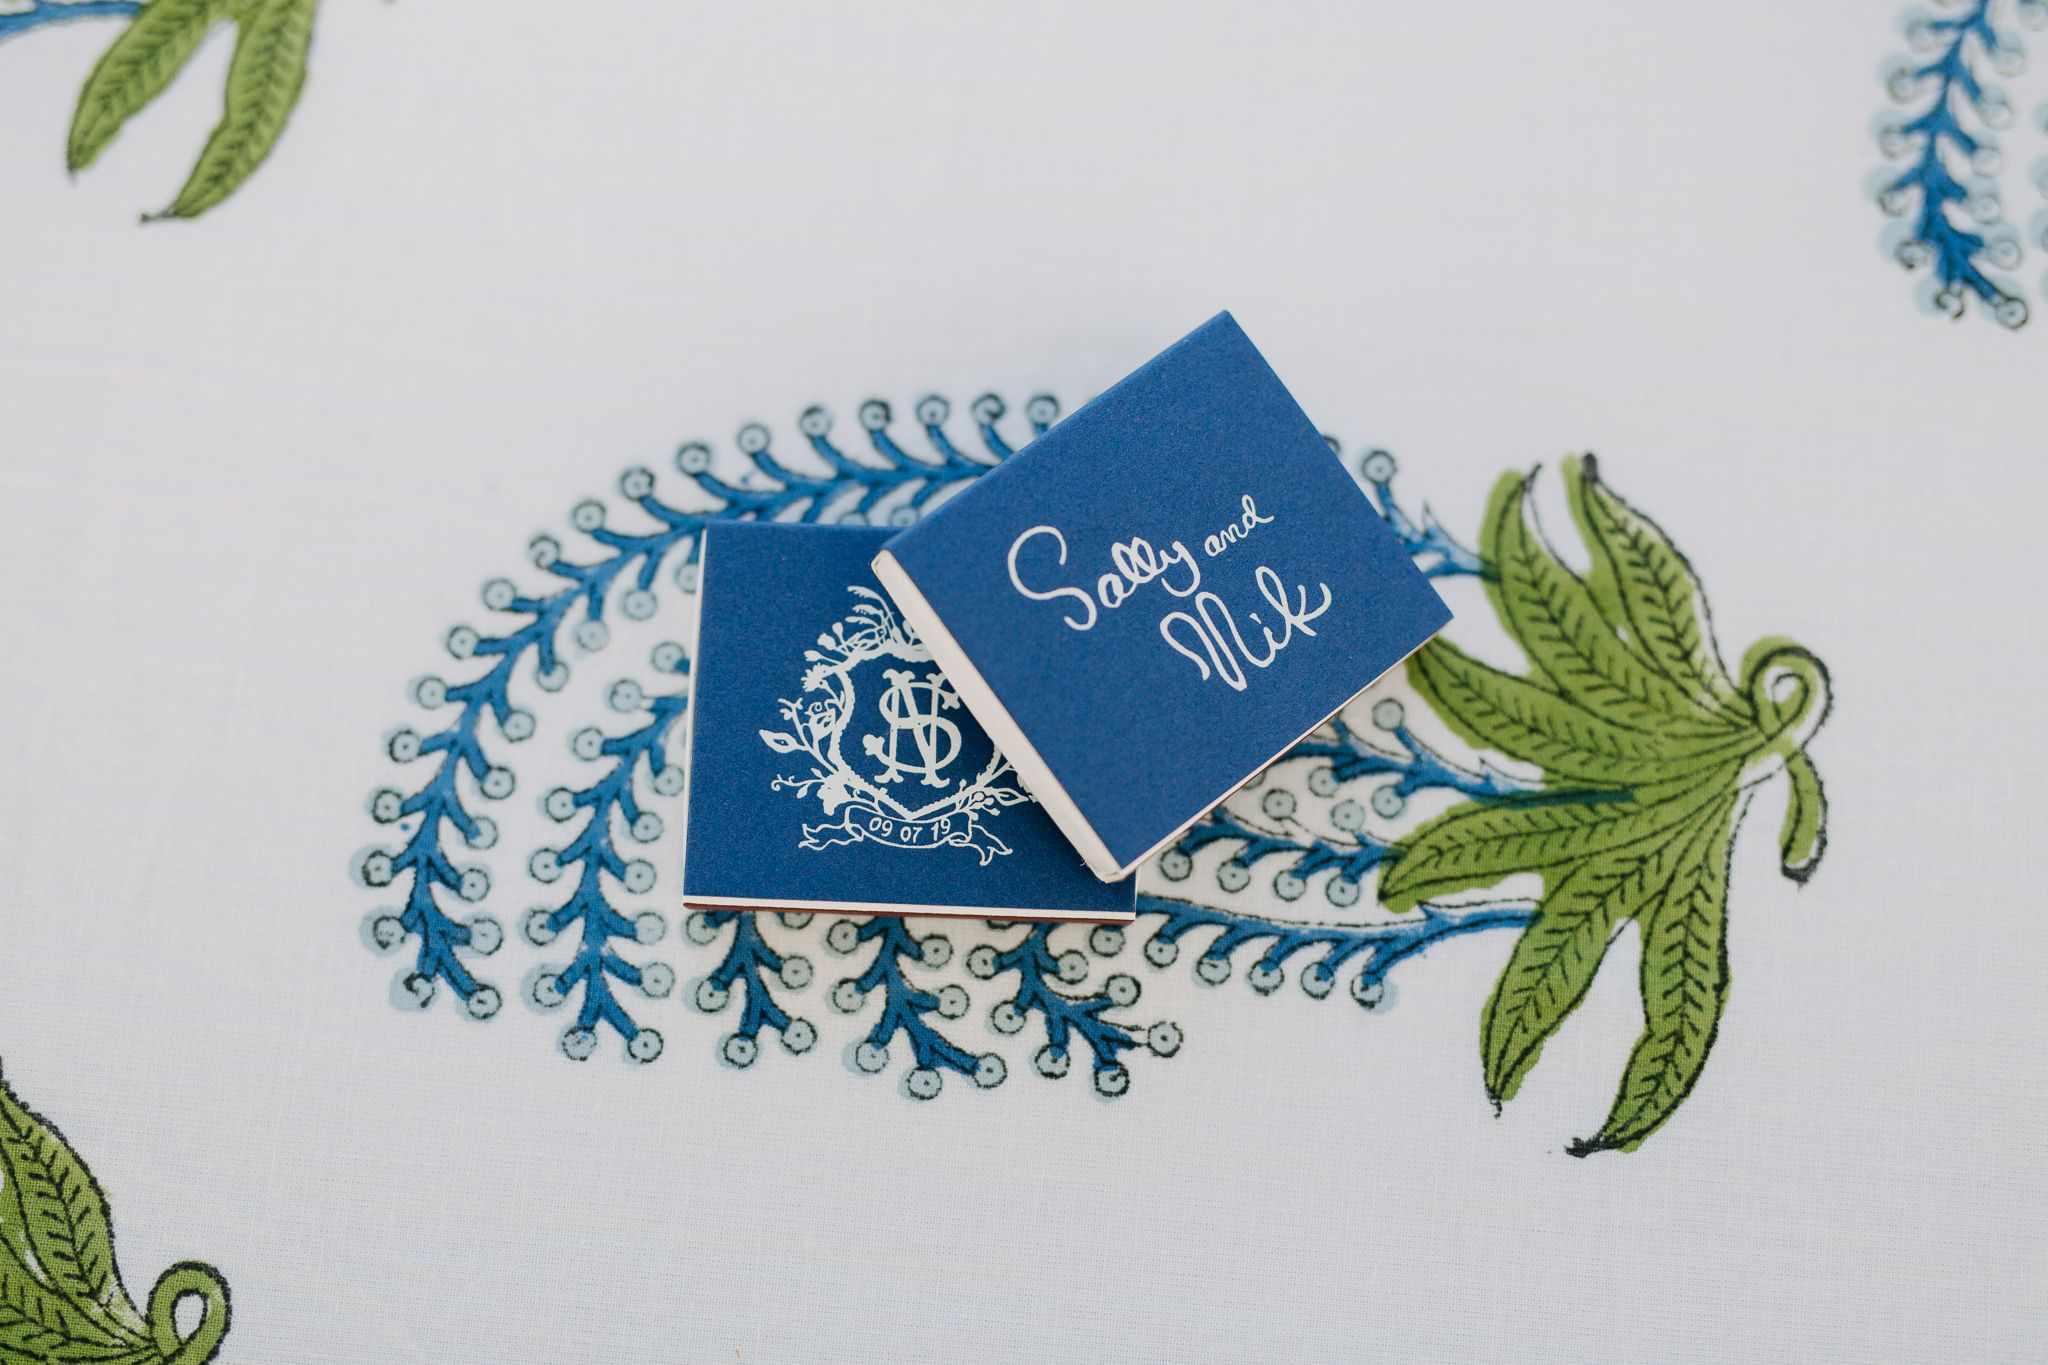 Custom blue playing cards as wedding favor